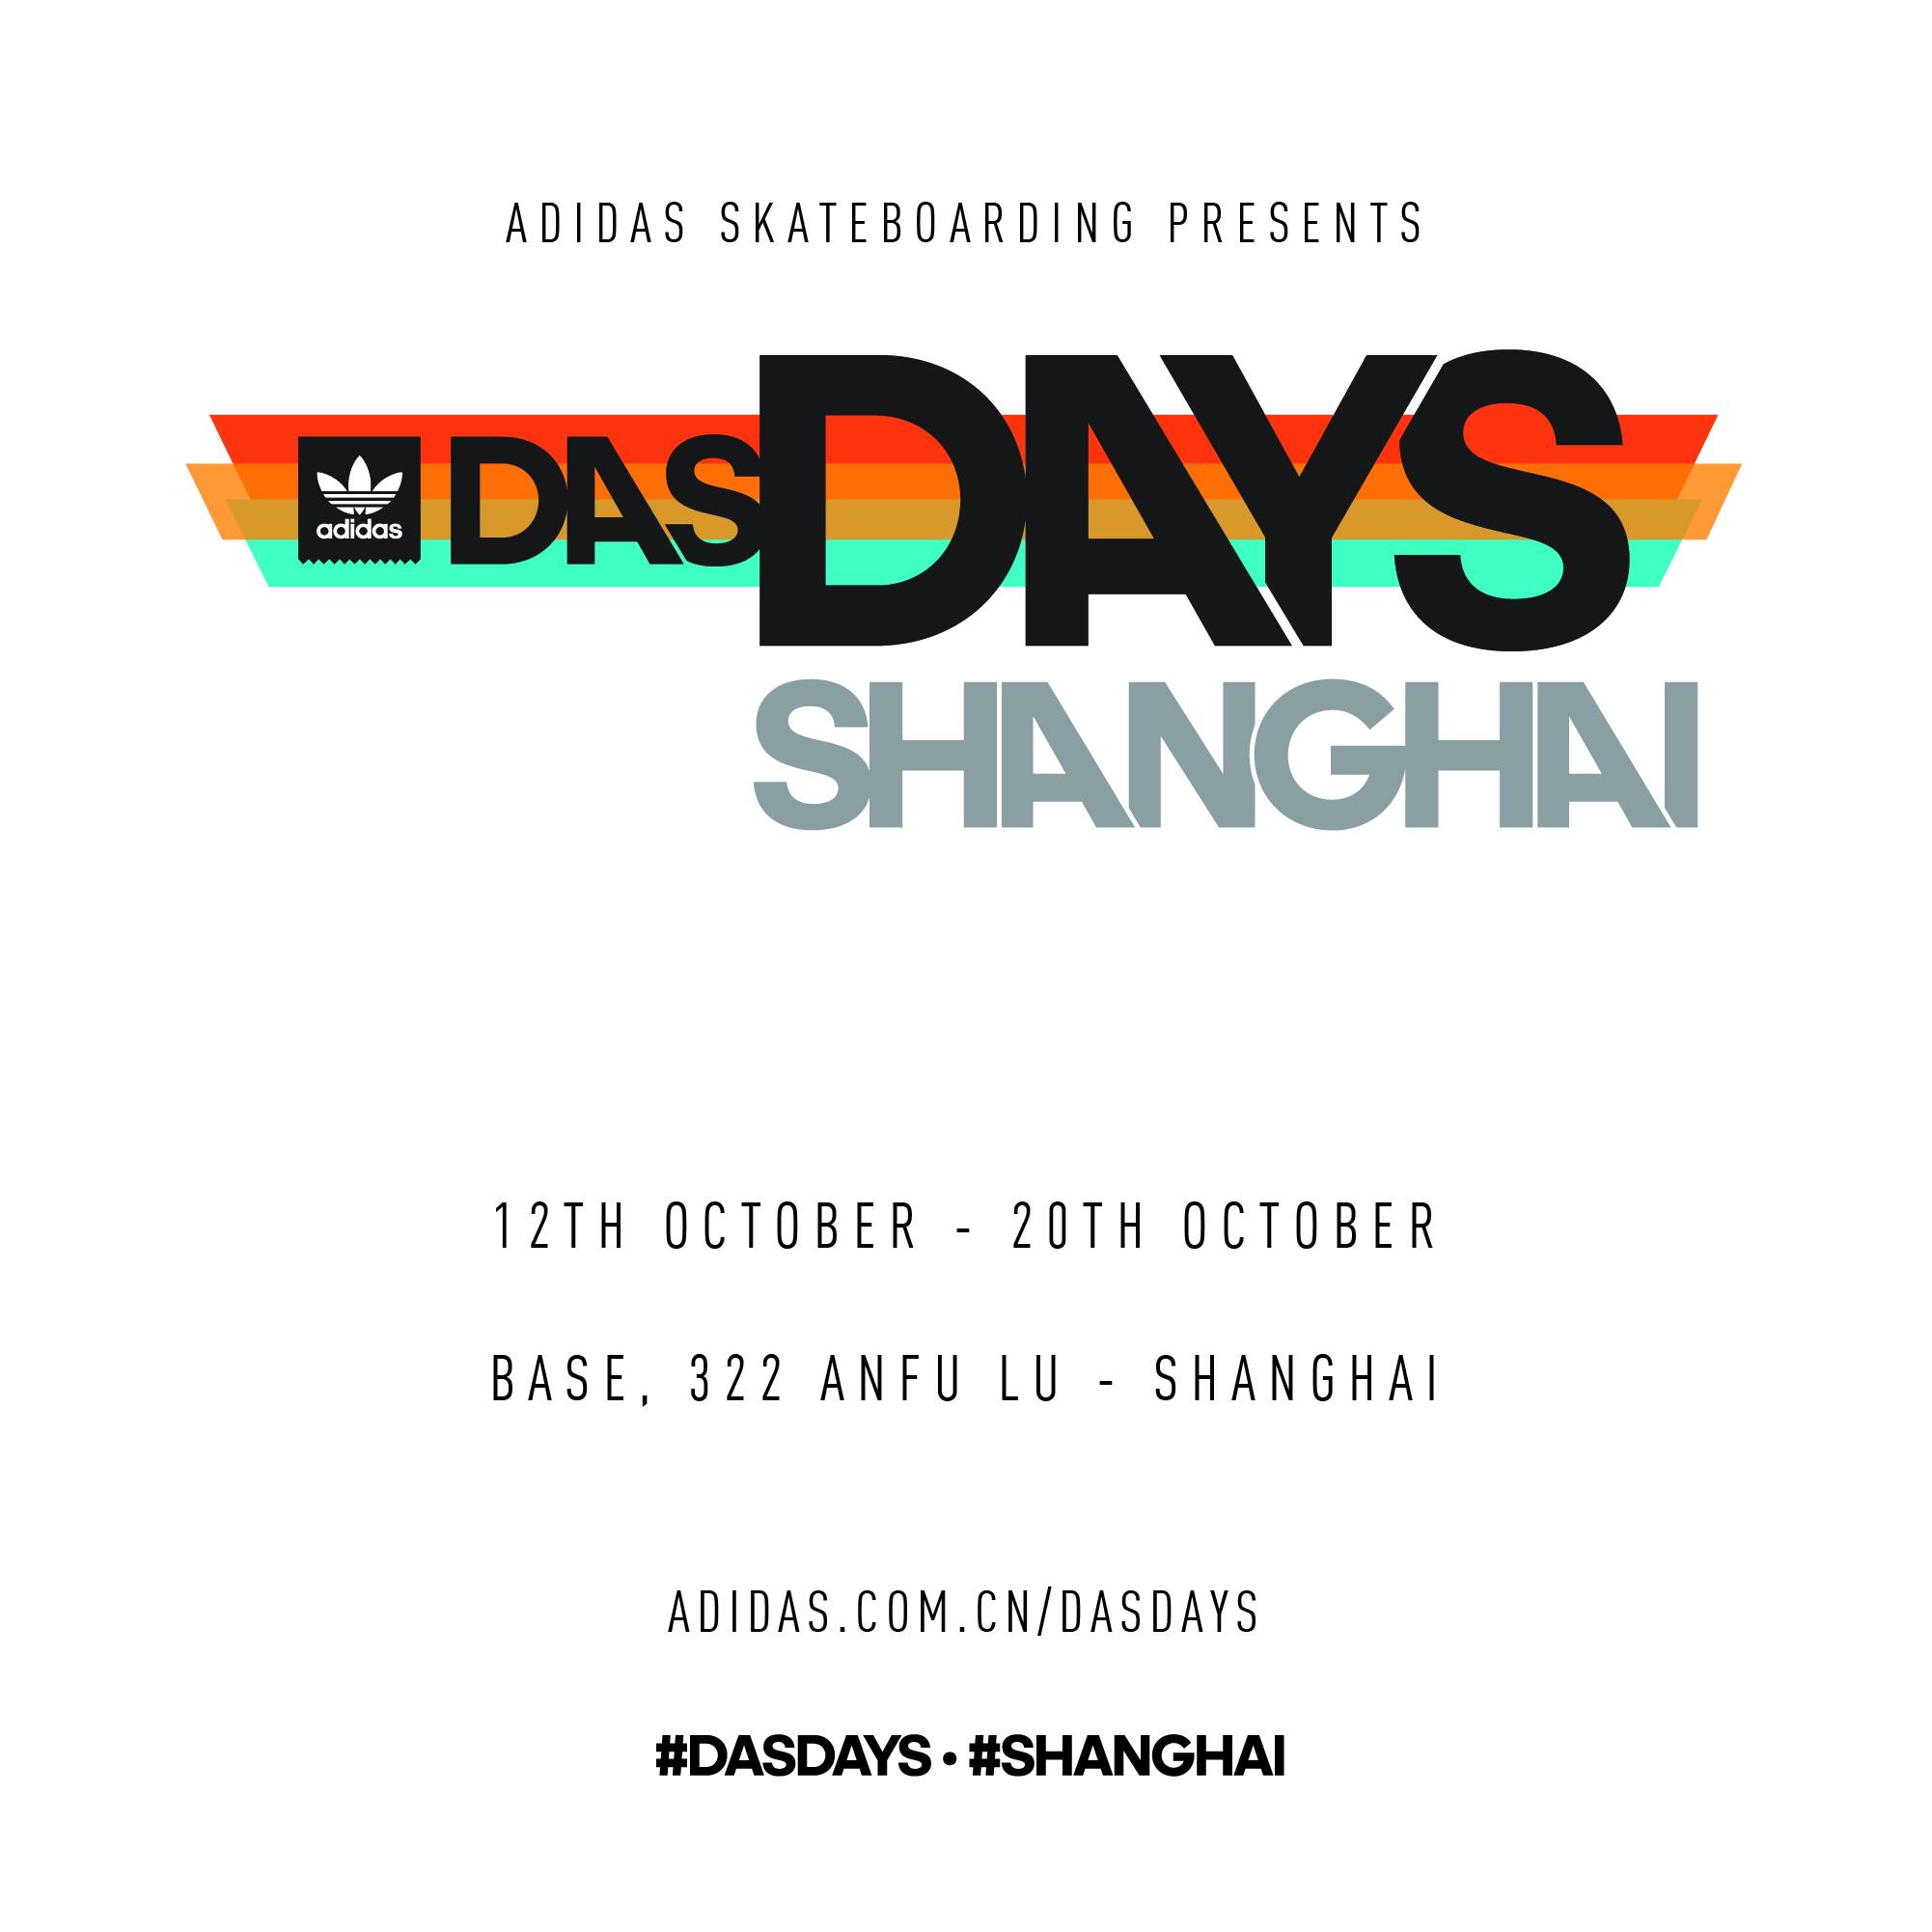 adidas Das Days Shanghai -